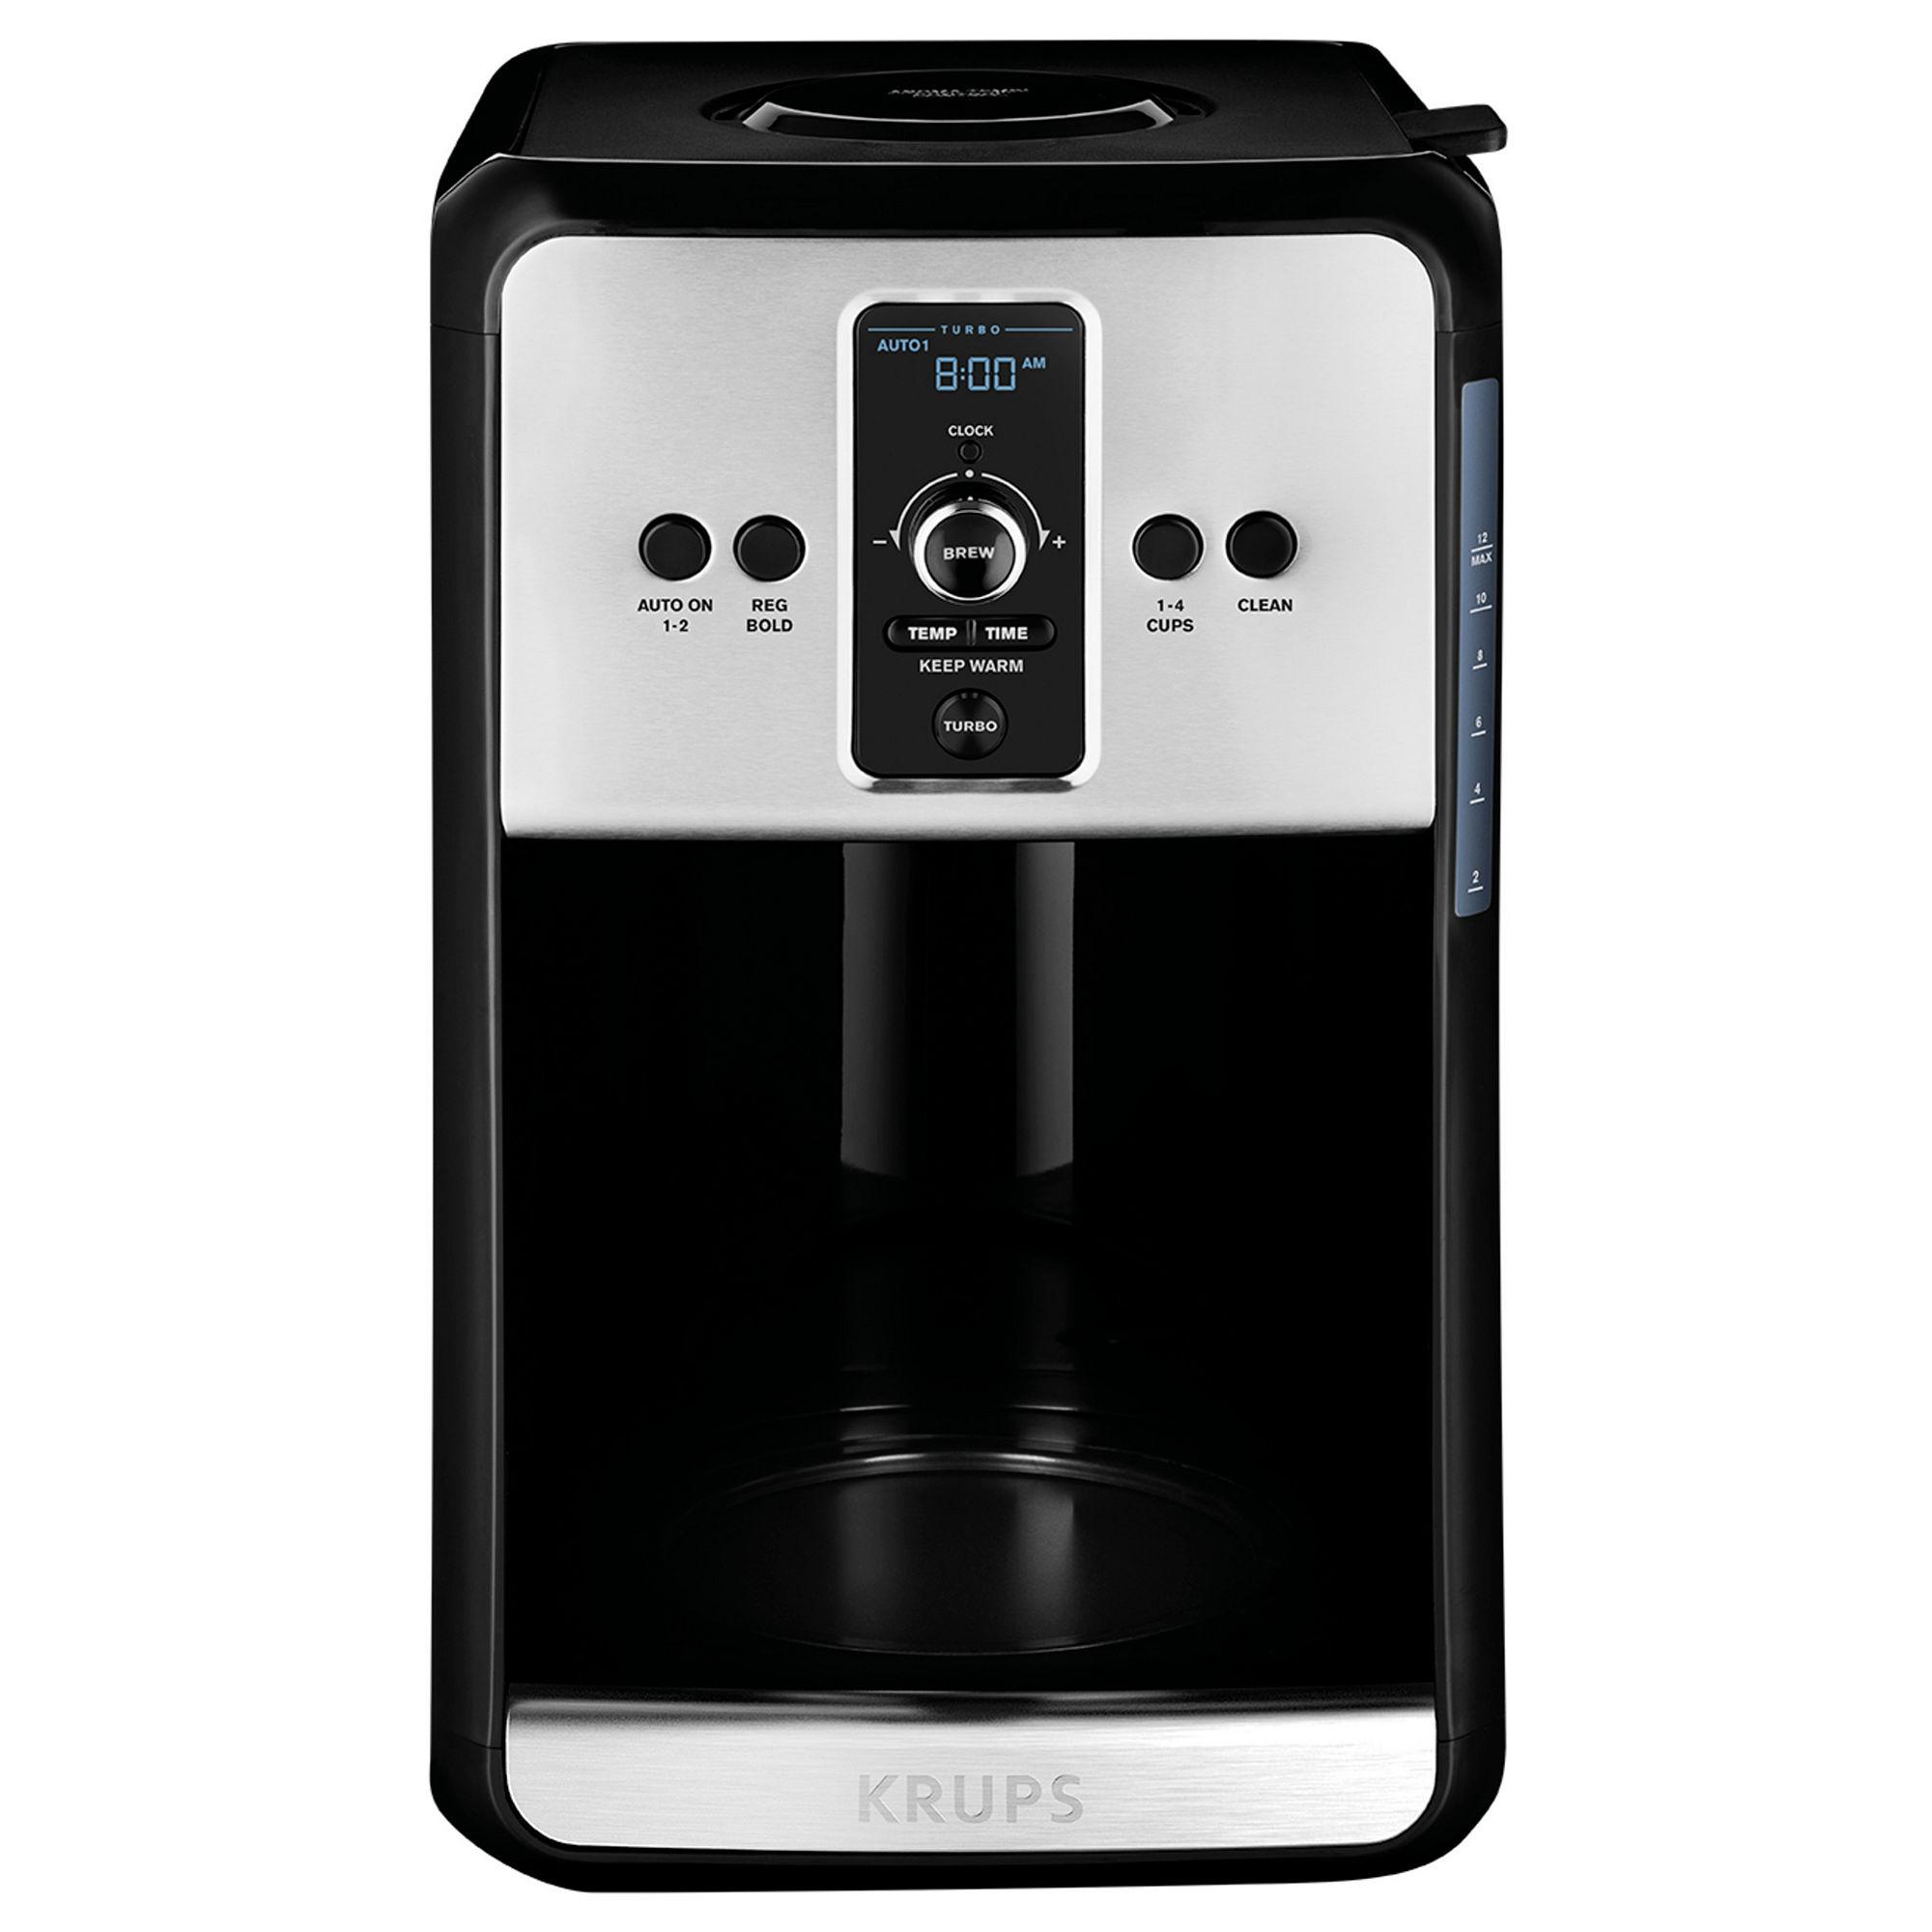 Krups, Turbo Savoy, EC411050, Programmable Filter Coffee Machine, Black